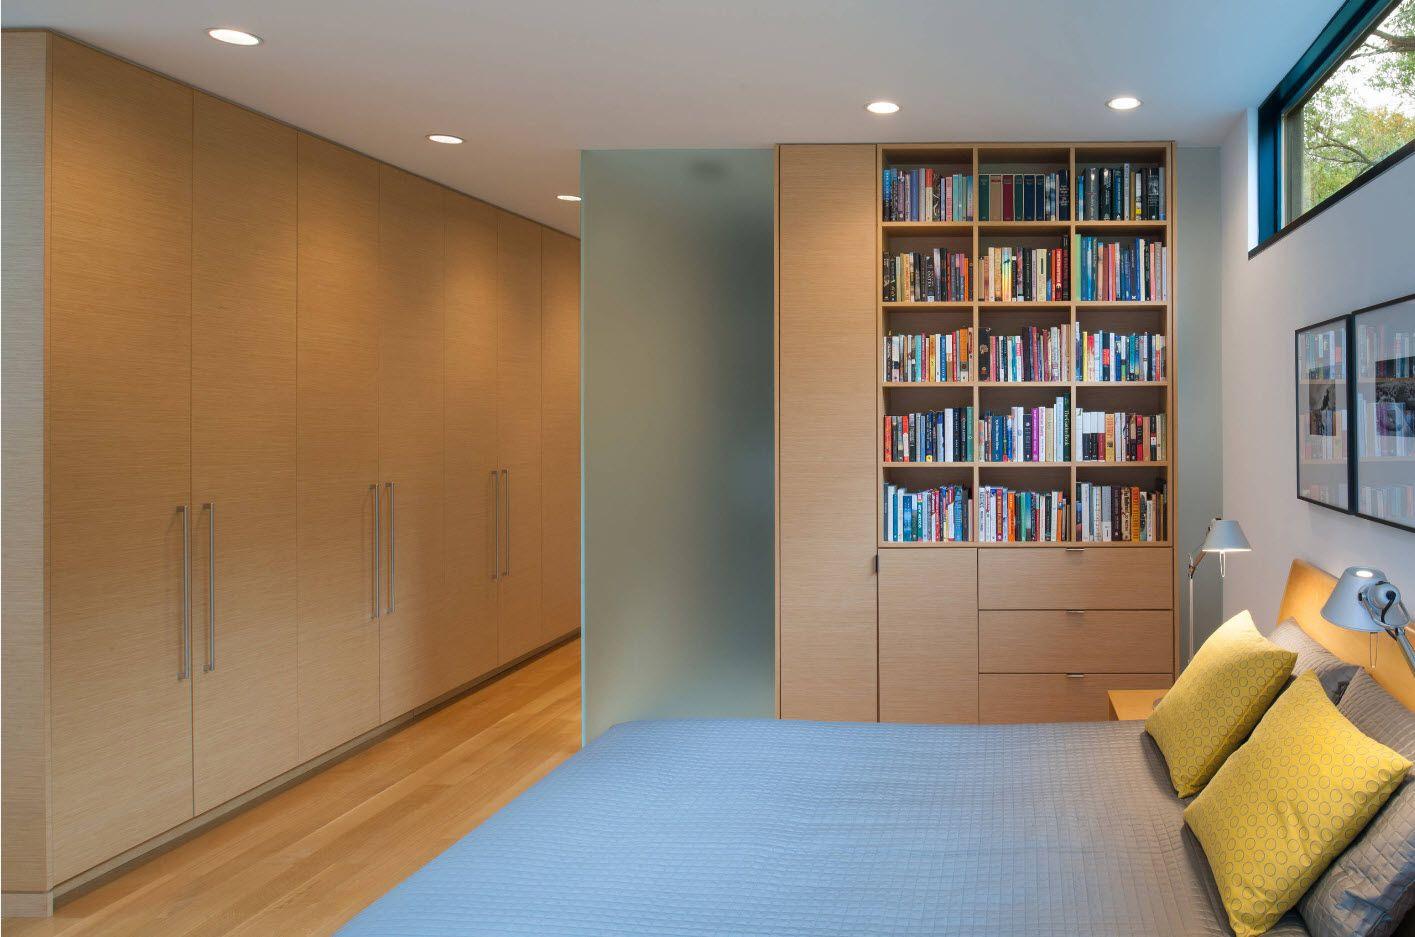 Library-bedroom zoning ideas